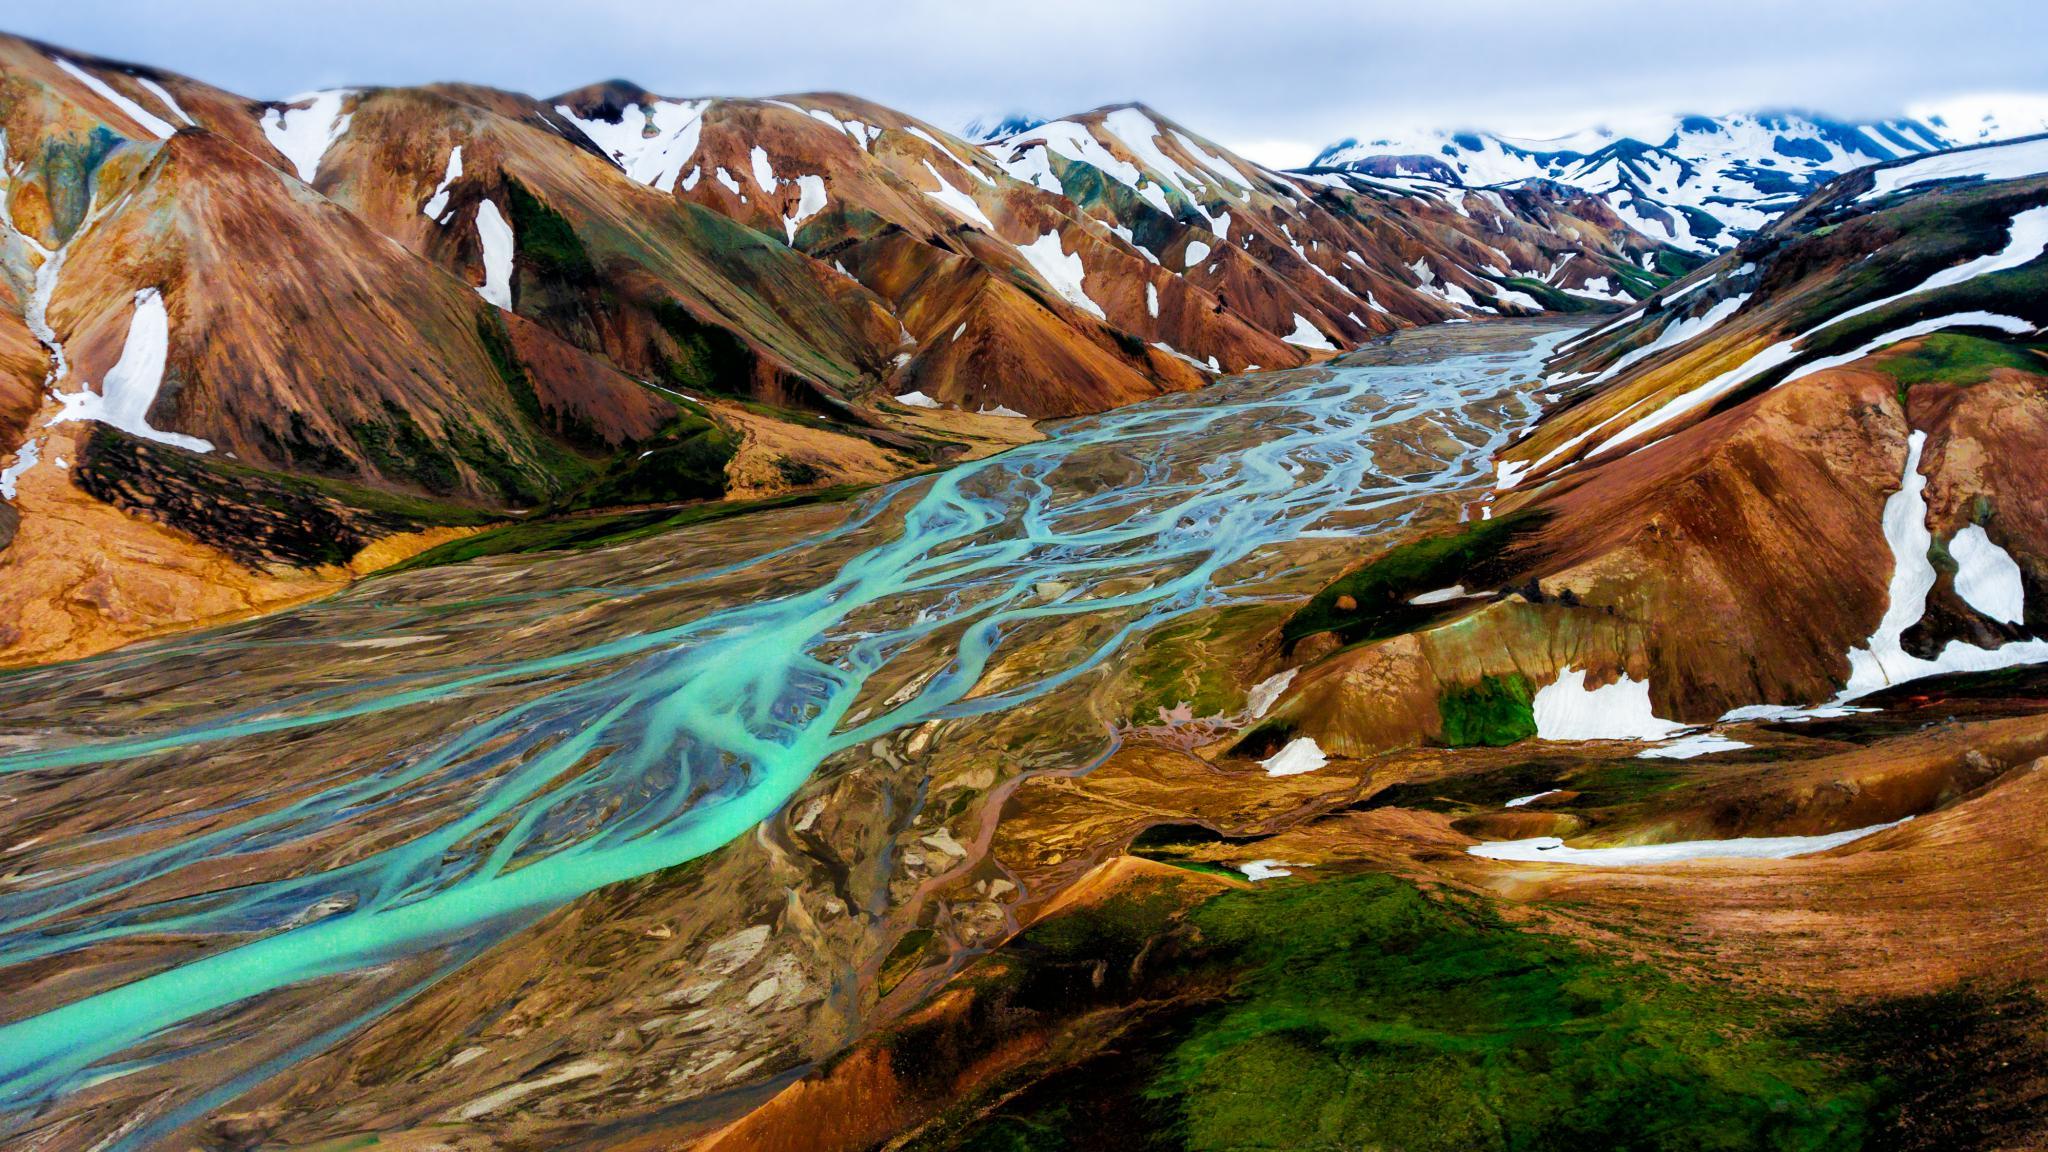 Highland landscape of Landmannalaugar, Iceland